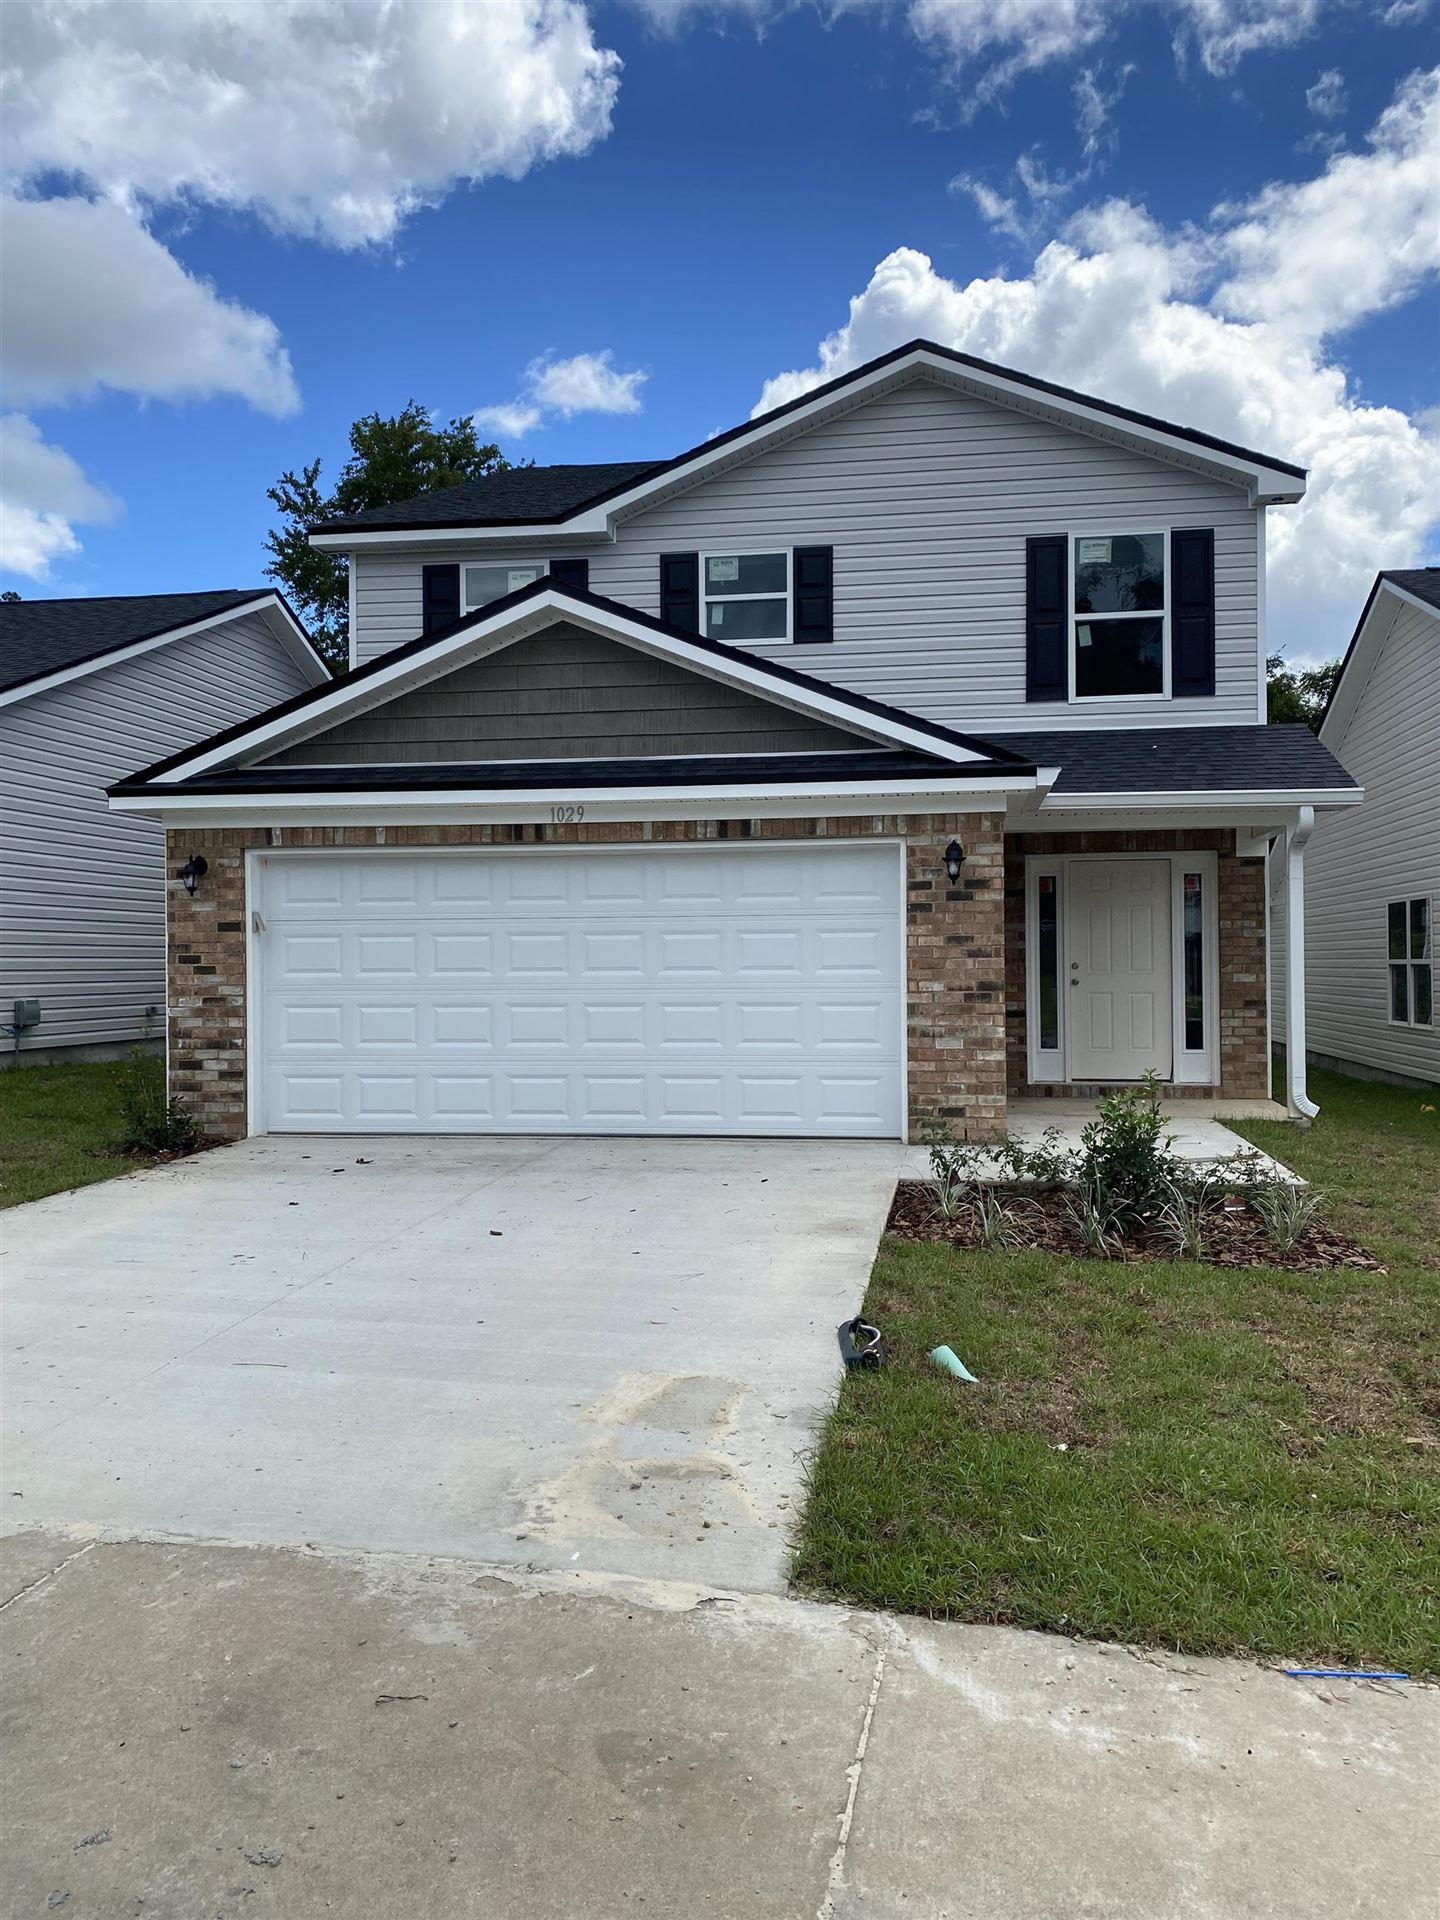 1029 Lacey Lane, Tallahassee, FL 32304 - MLS#: 329554